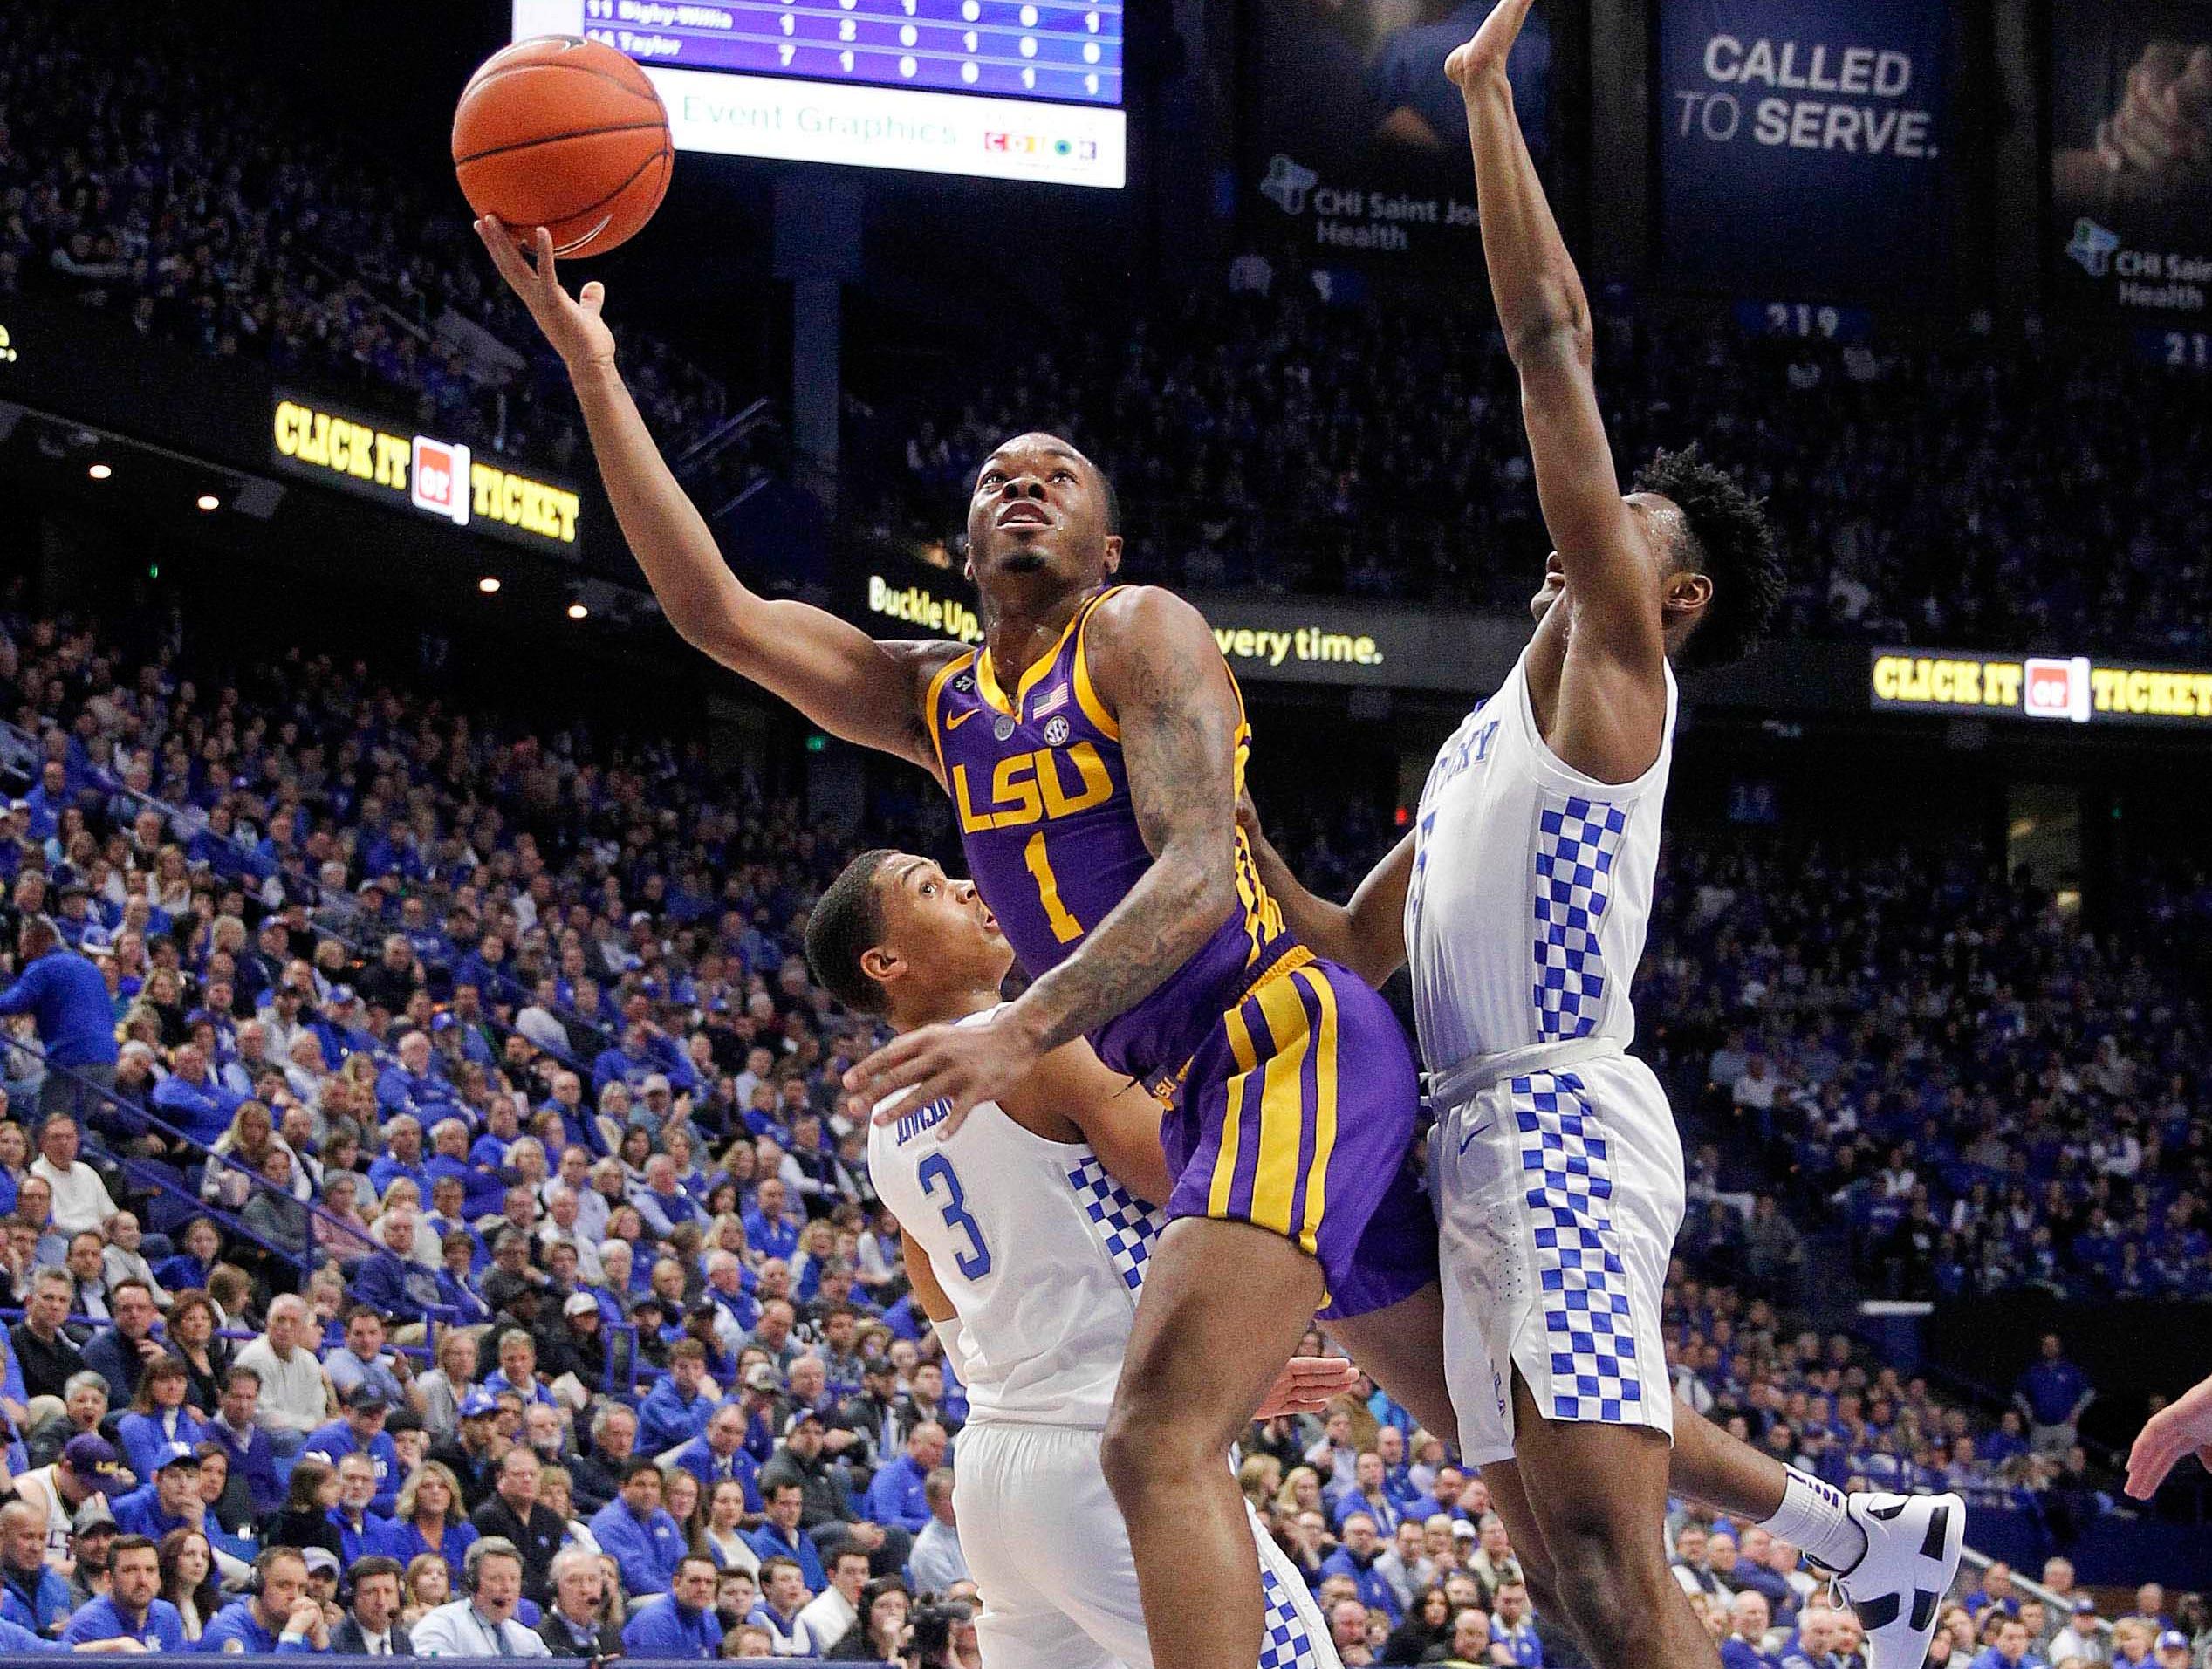 Feb 12, 2019; Lexington, KY, USA; LSU Tigers guard Ja'vonte Smart (1) shoots the ball against Kentucky Wildcats guard Keldon Johnson (3) in the first half at Rupp Arena. Mandatory Credit: Mark Zerof-USA TODAY Sports